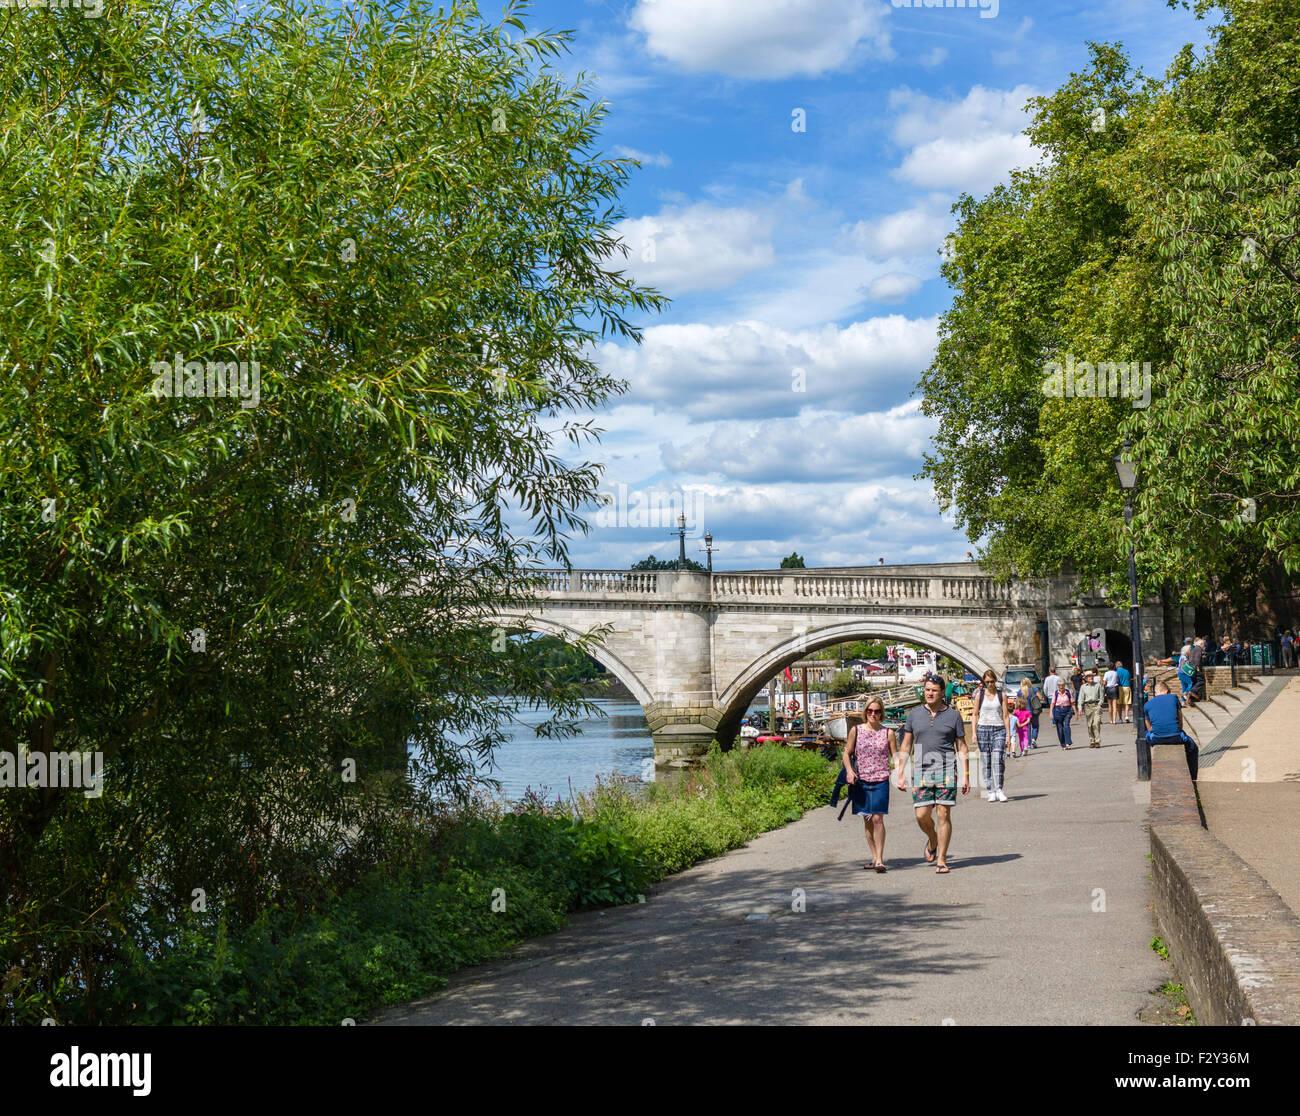 Riverside and Thames Path, Richmond upon Thames, London, England, UK - Stock Image